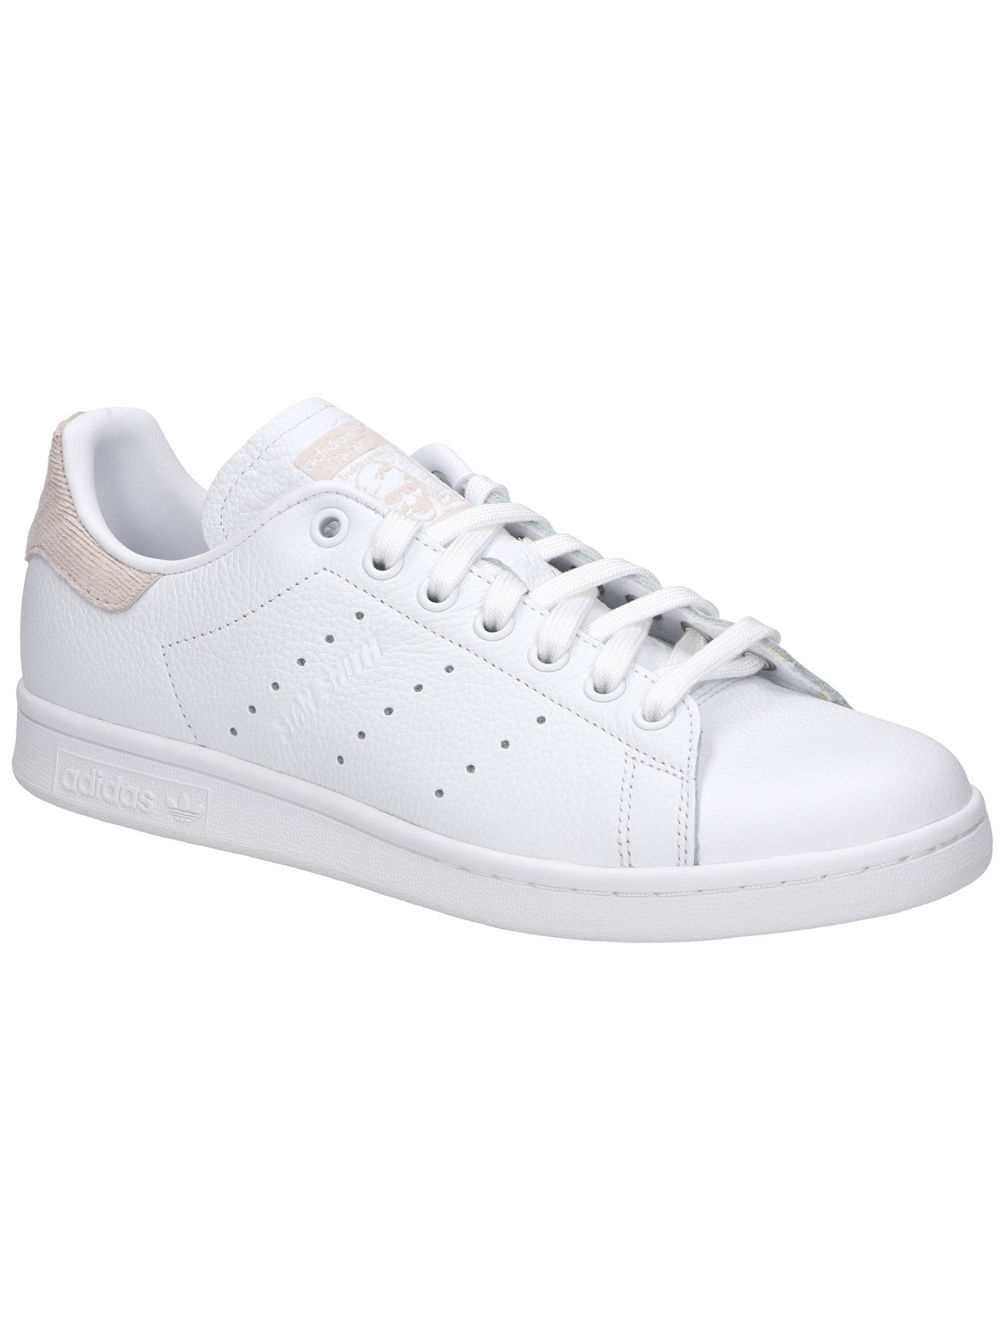 55d118dcb12 Compra adidas Originals Stan Smith Sneakers online na Blue Tomato